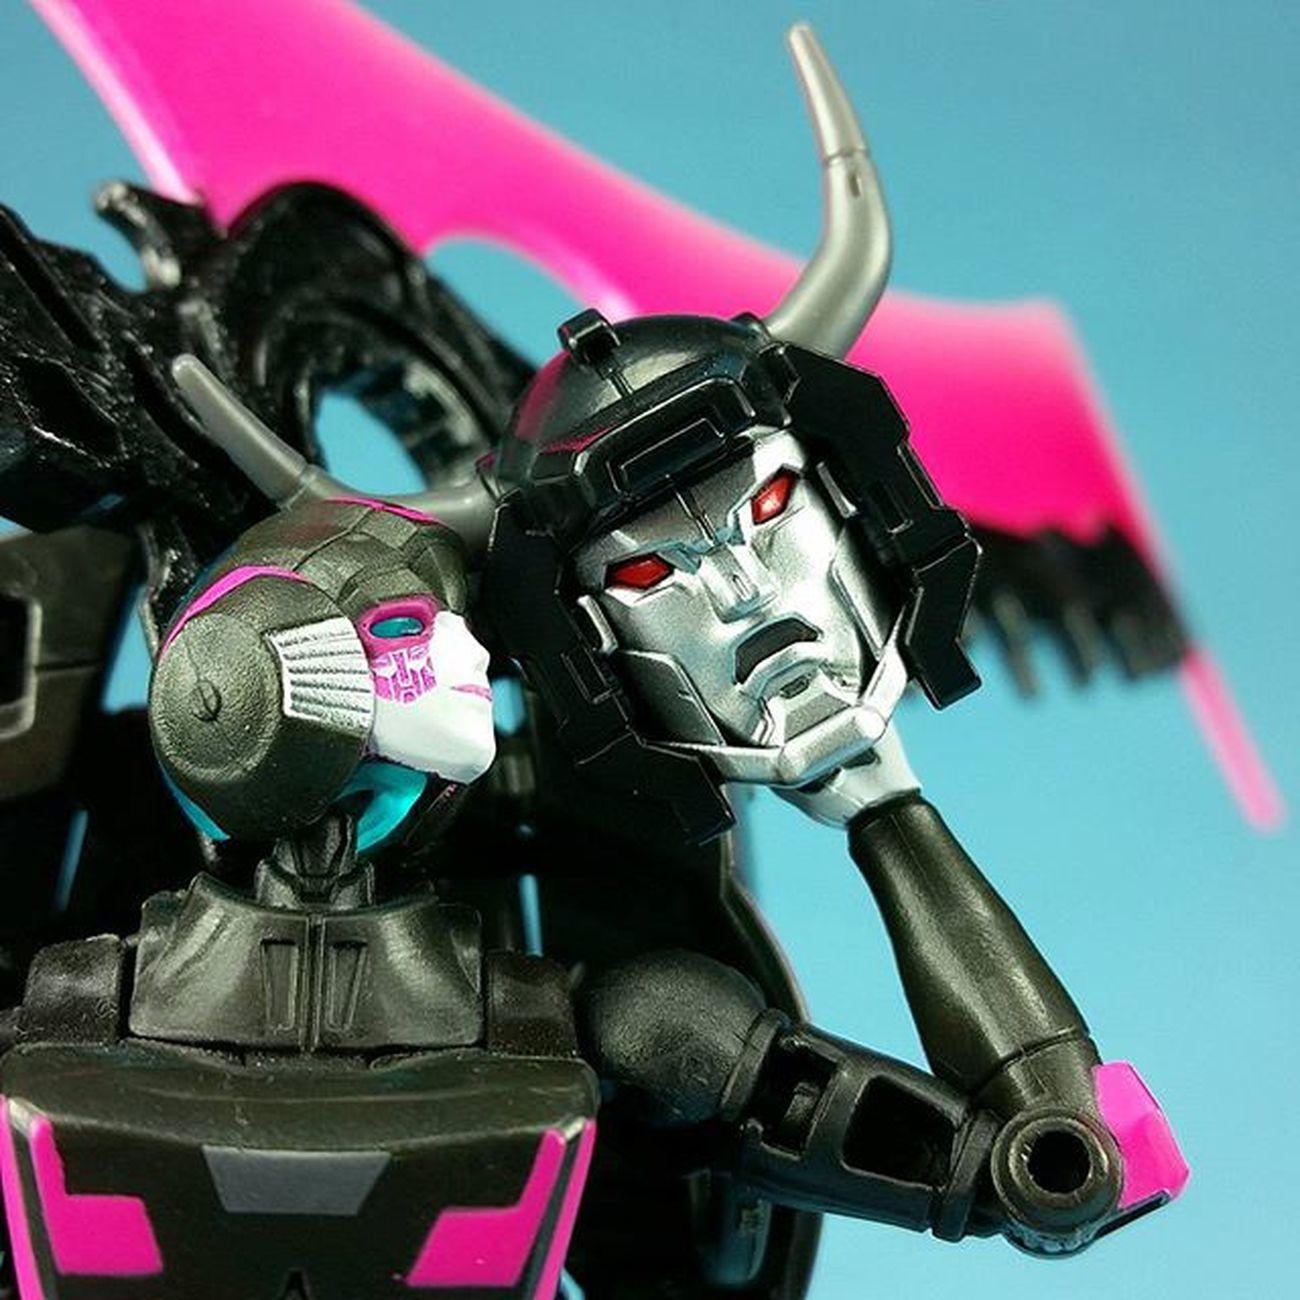 666 - The number of the beast. Transformers Arcee Menasor